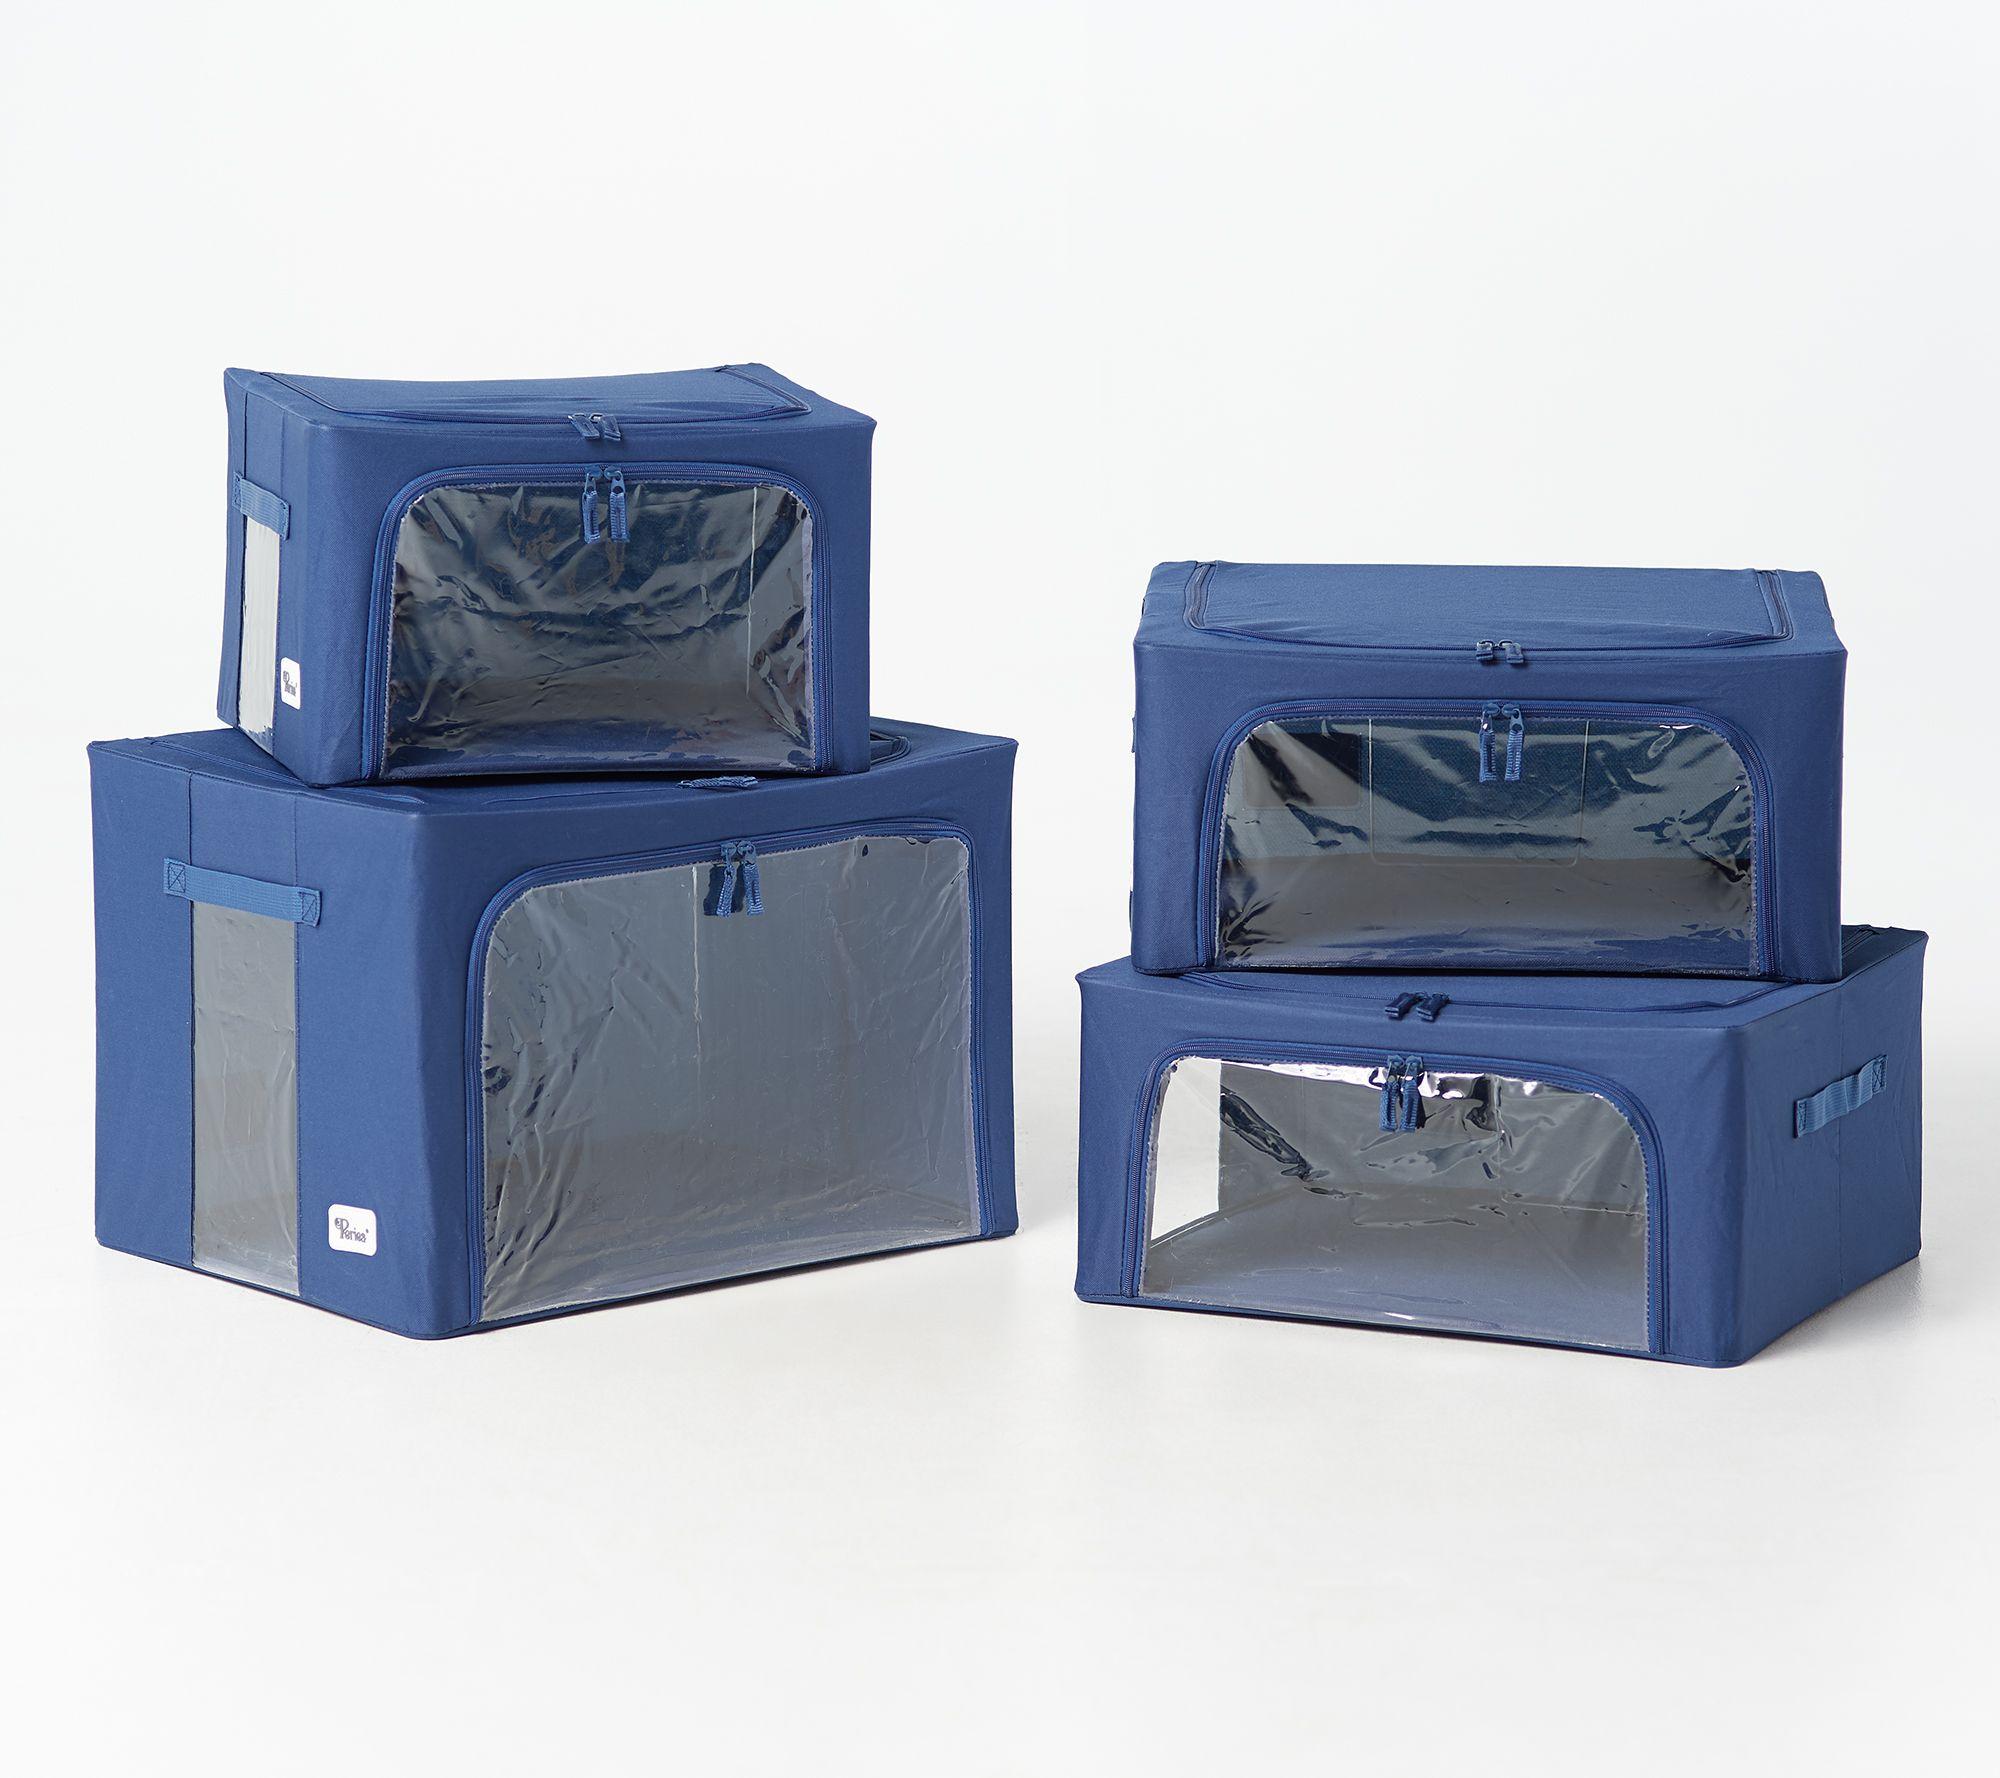 Travel Luggage Duffle Bag Lightweight Portable Handbag Colorful Easter Painting Large Capacity Waterproof Foldable Storage Tote